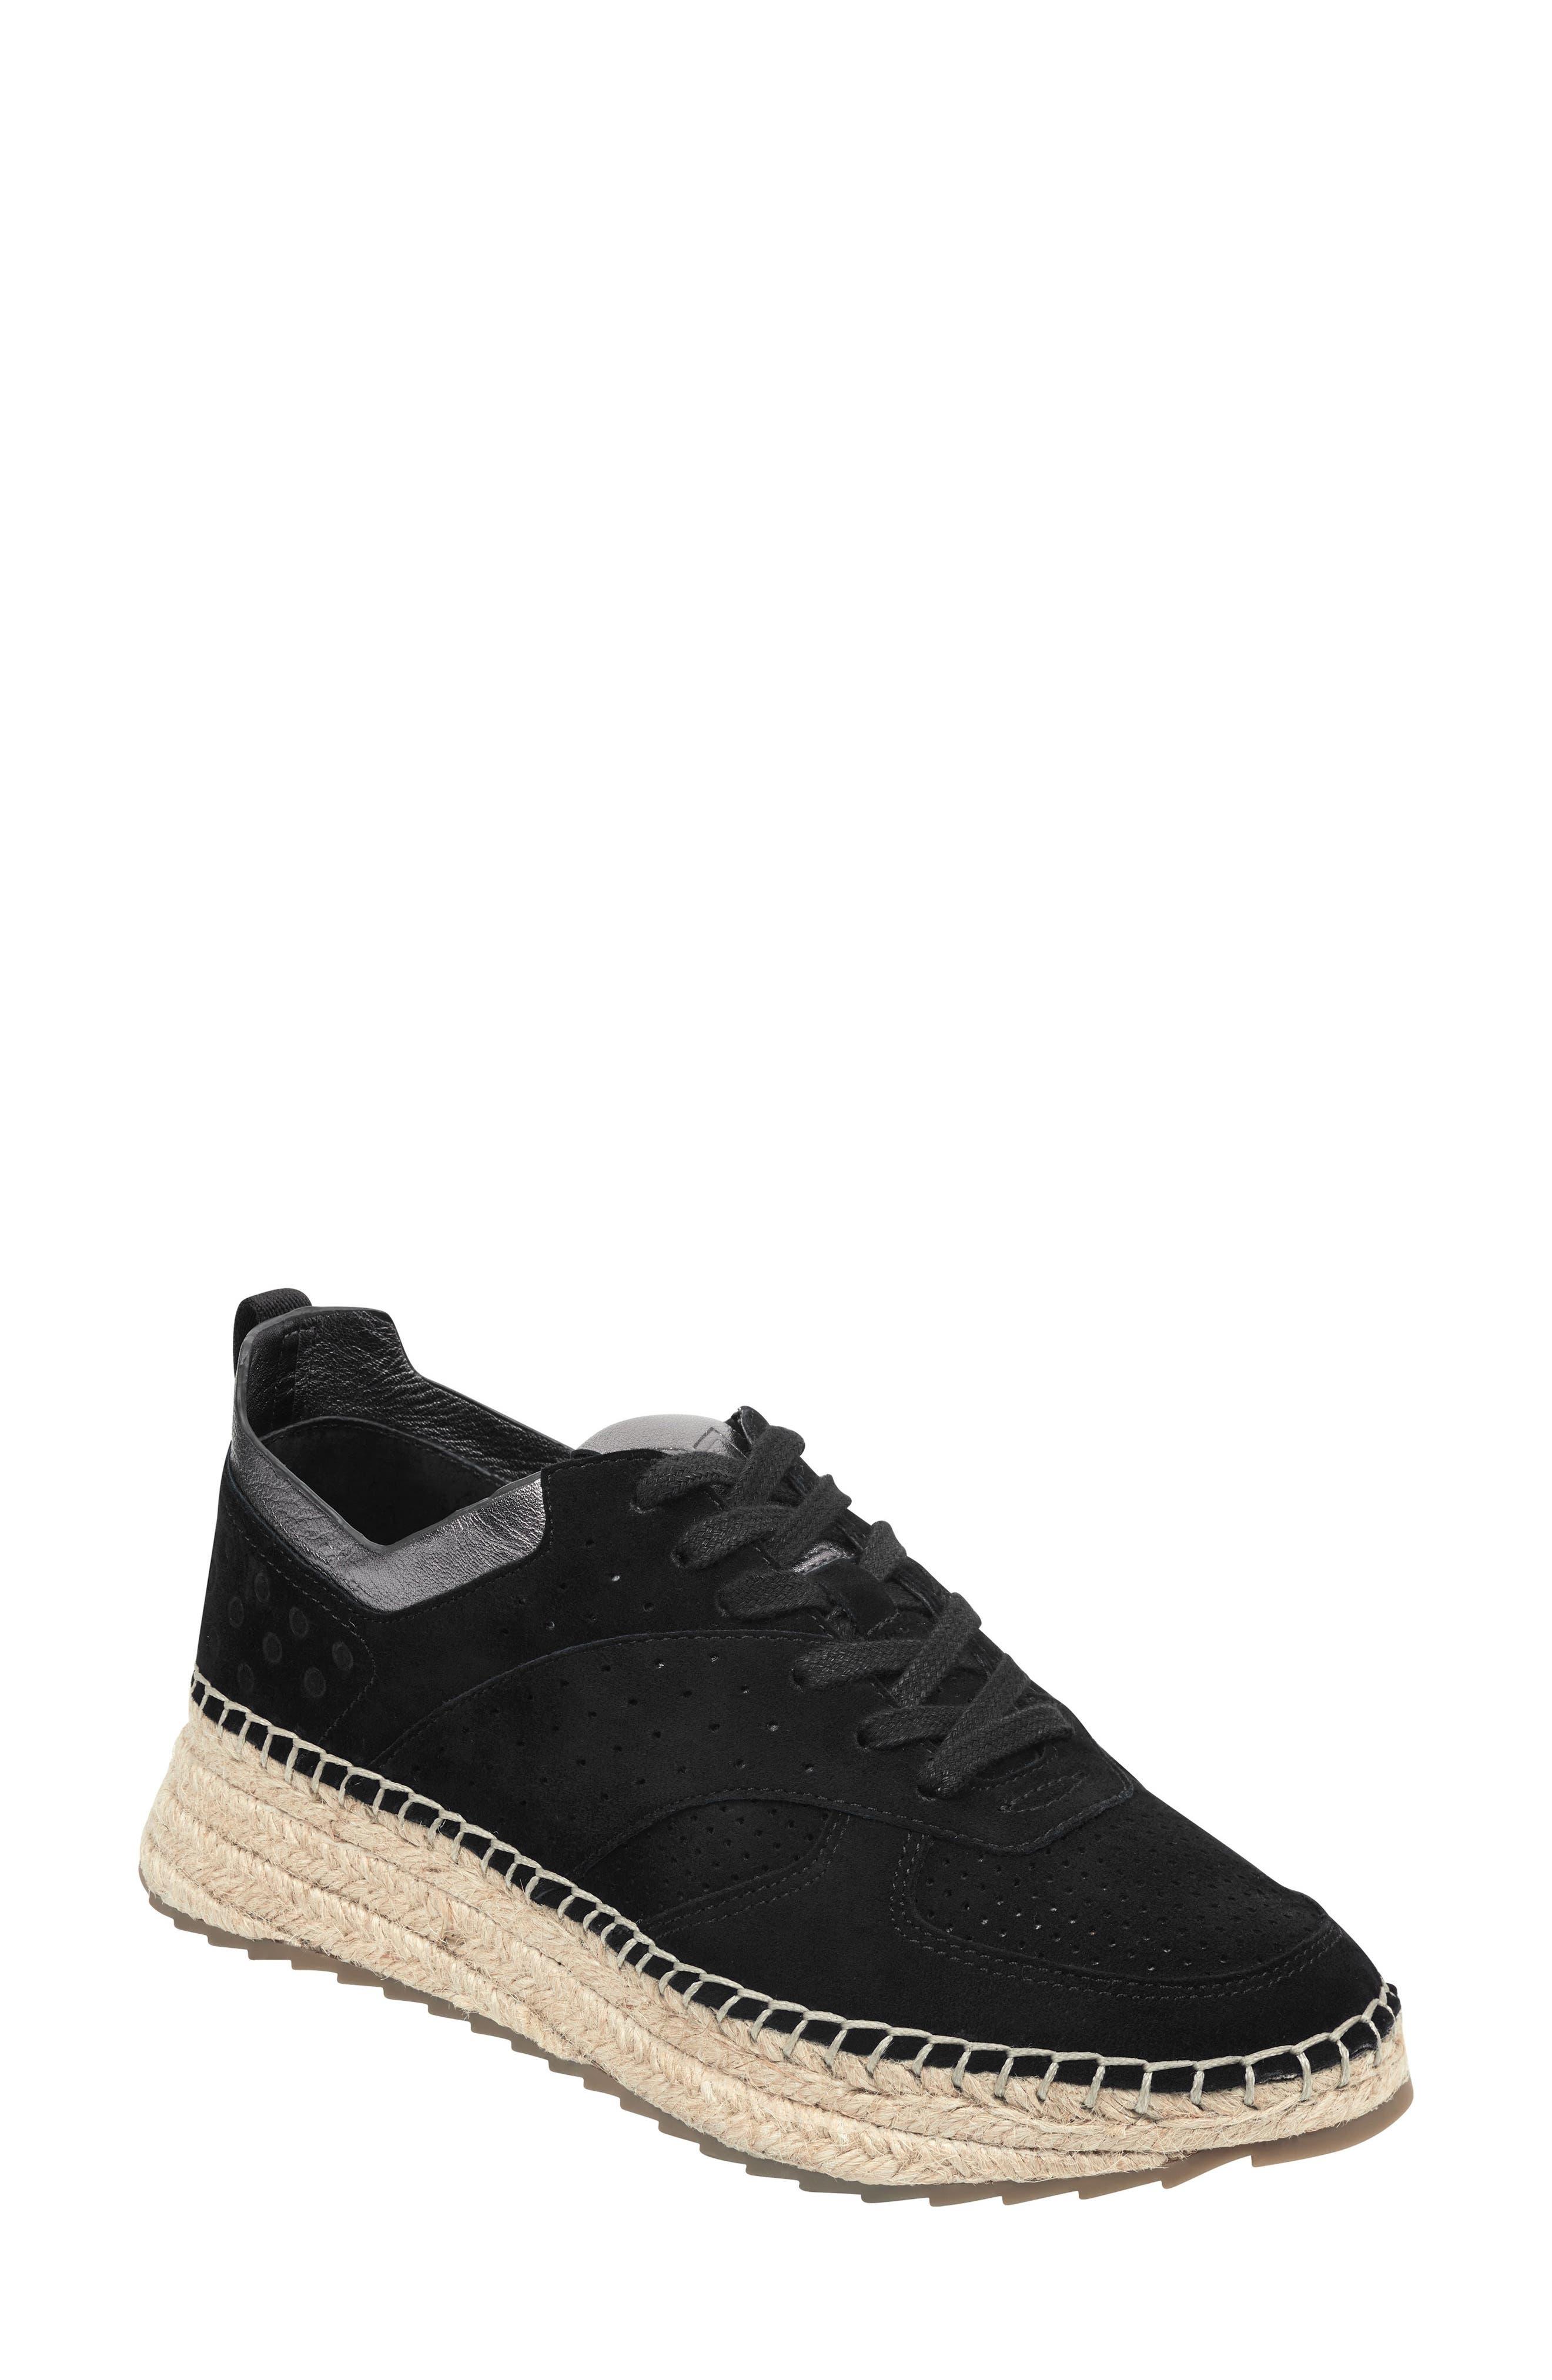 MARC FISHER LTD, Julio Sneaker, Main thumbnail 1, color, BLACK SUEDE